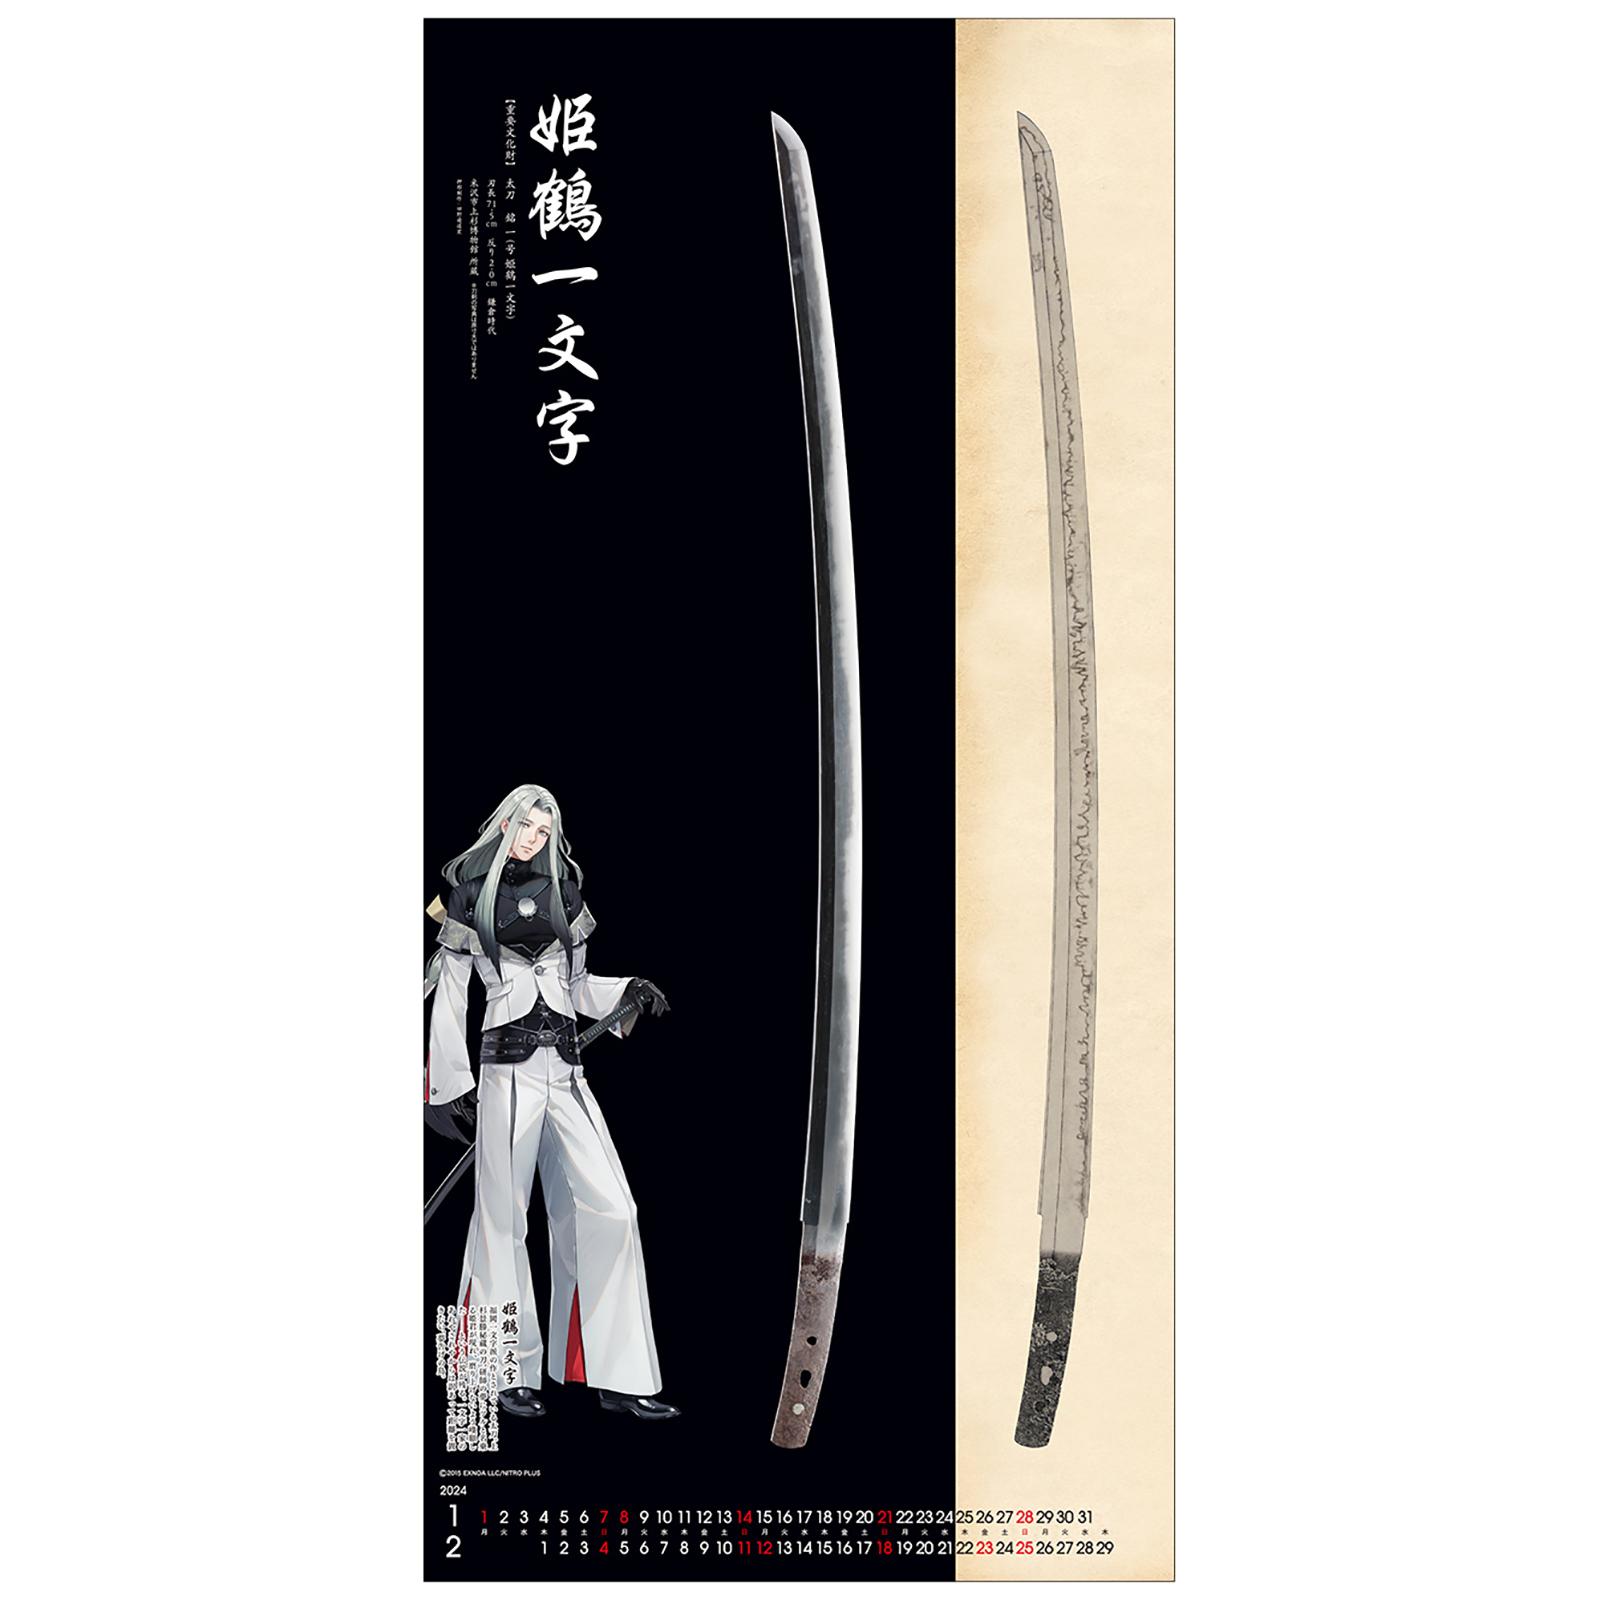 TD-30302(2022年版)<br />刀剣カレンダー・壁掛M 刀剣乱舞-ONLINE-